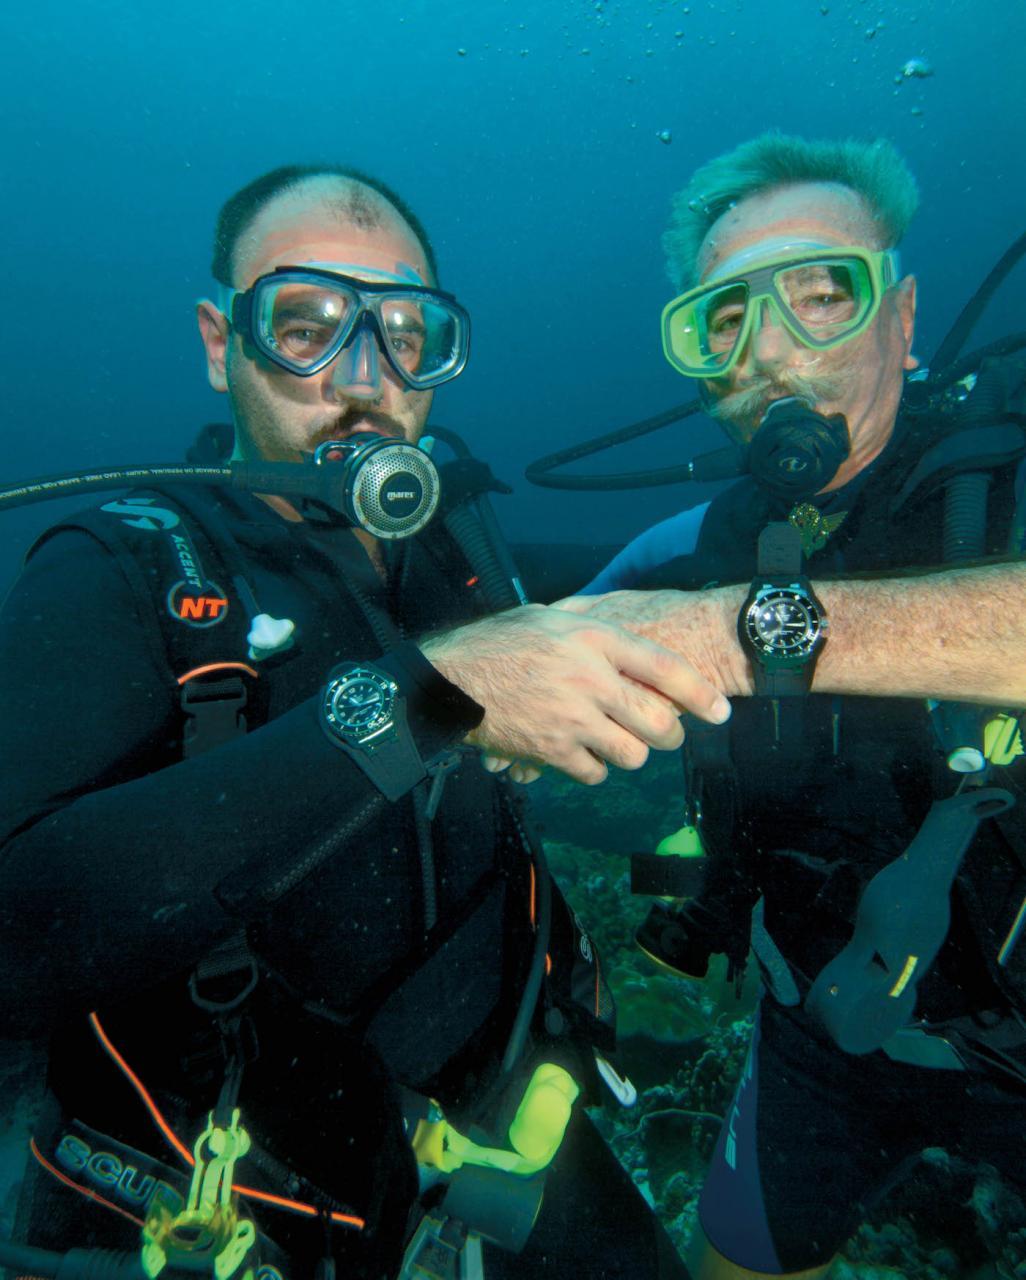 Blancpain Fifty Fathoms Nageurs De Combat fake Watches